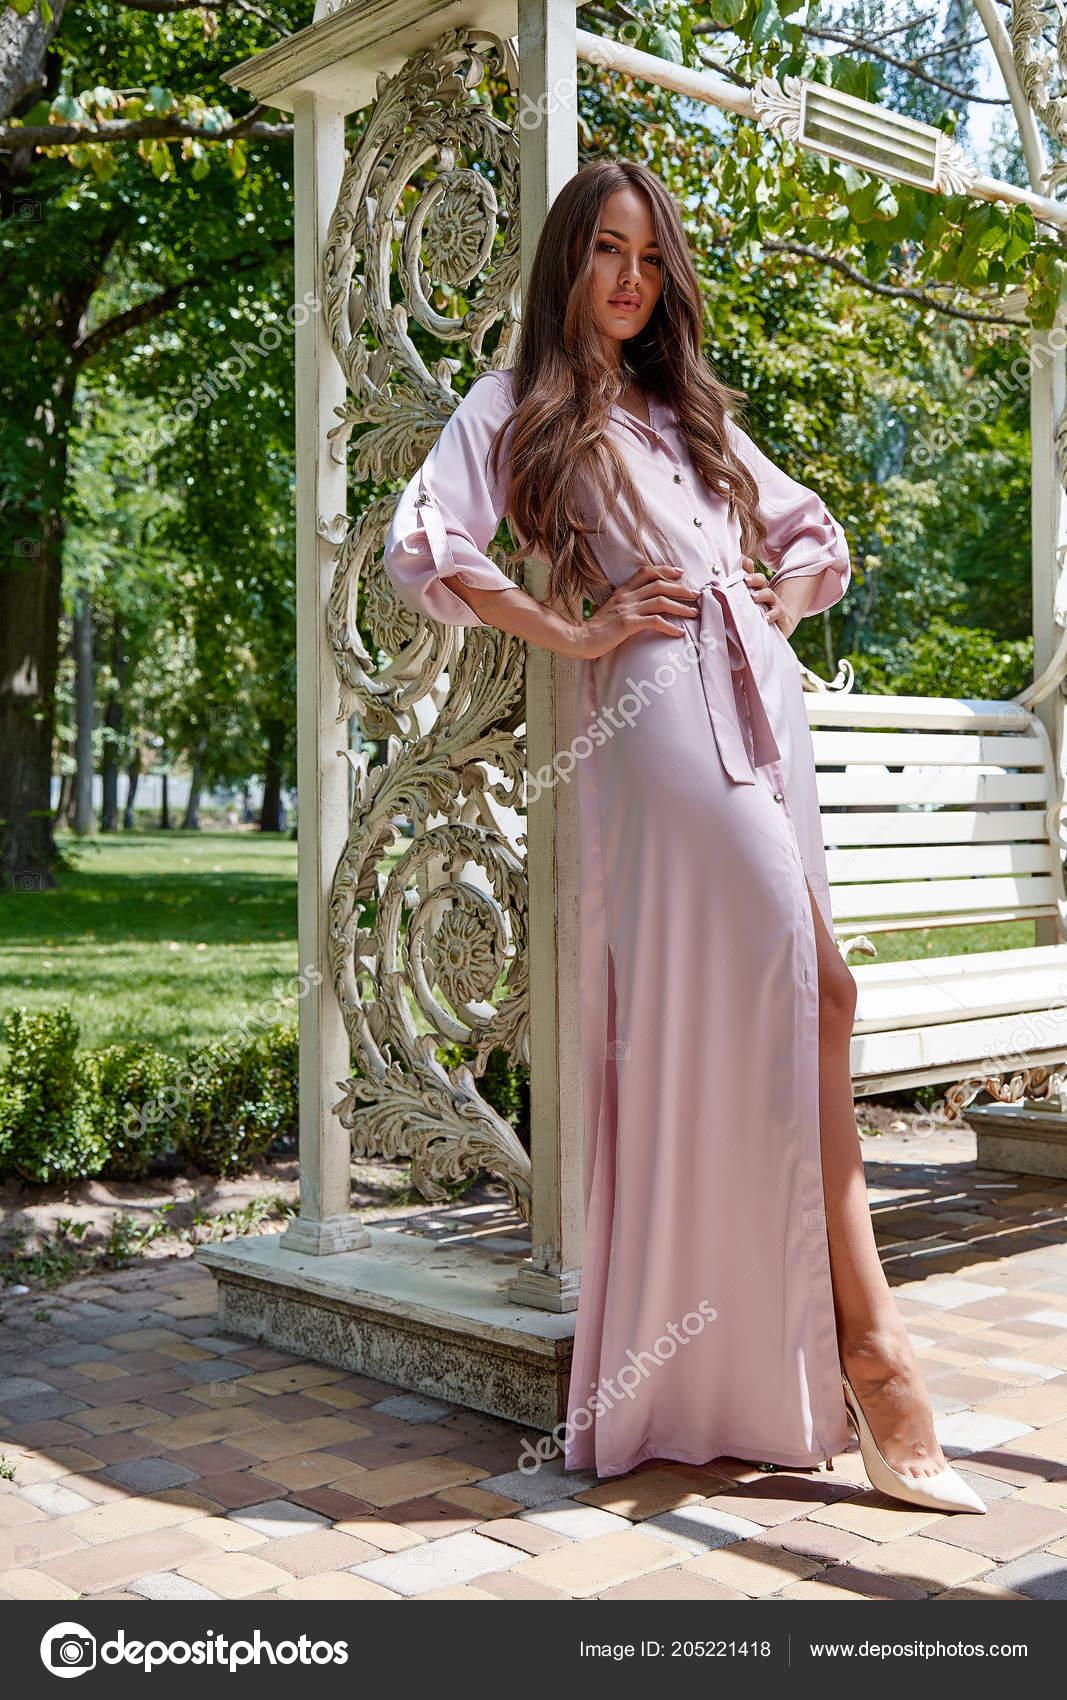 cb1c06a28336 Όμορφη σέξι γυναίκα αρκετά χαριτωμένο πρόσωπο μακιγιάζ καλλυντικά μακριά  ξανθά μαλλιά μόδα μοντέλο αίγλη φορούν σχεδιαστής φόρεμα από ροζ μετάξι  απαλό ...